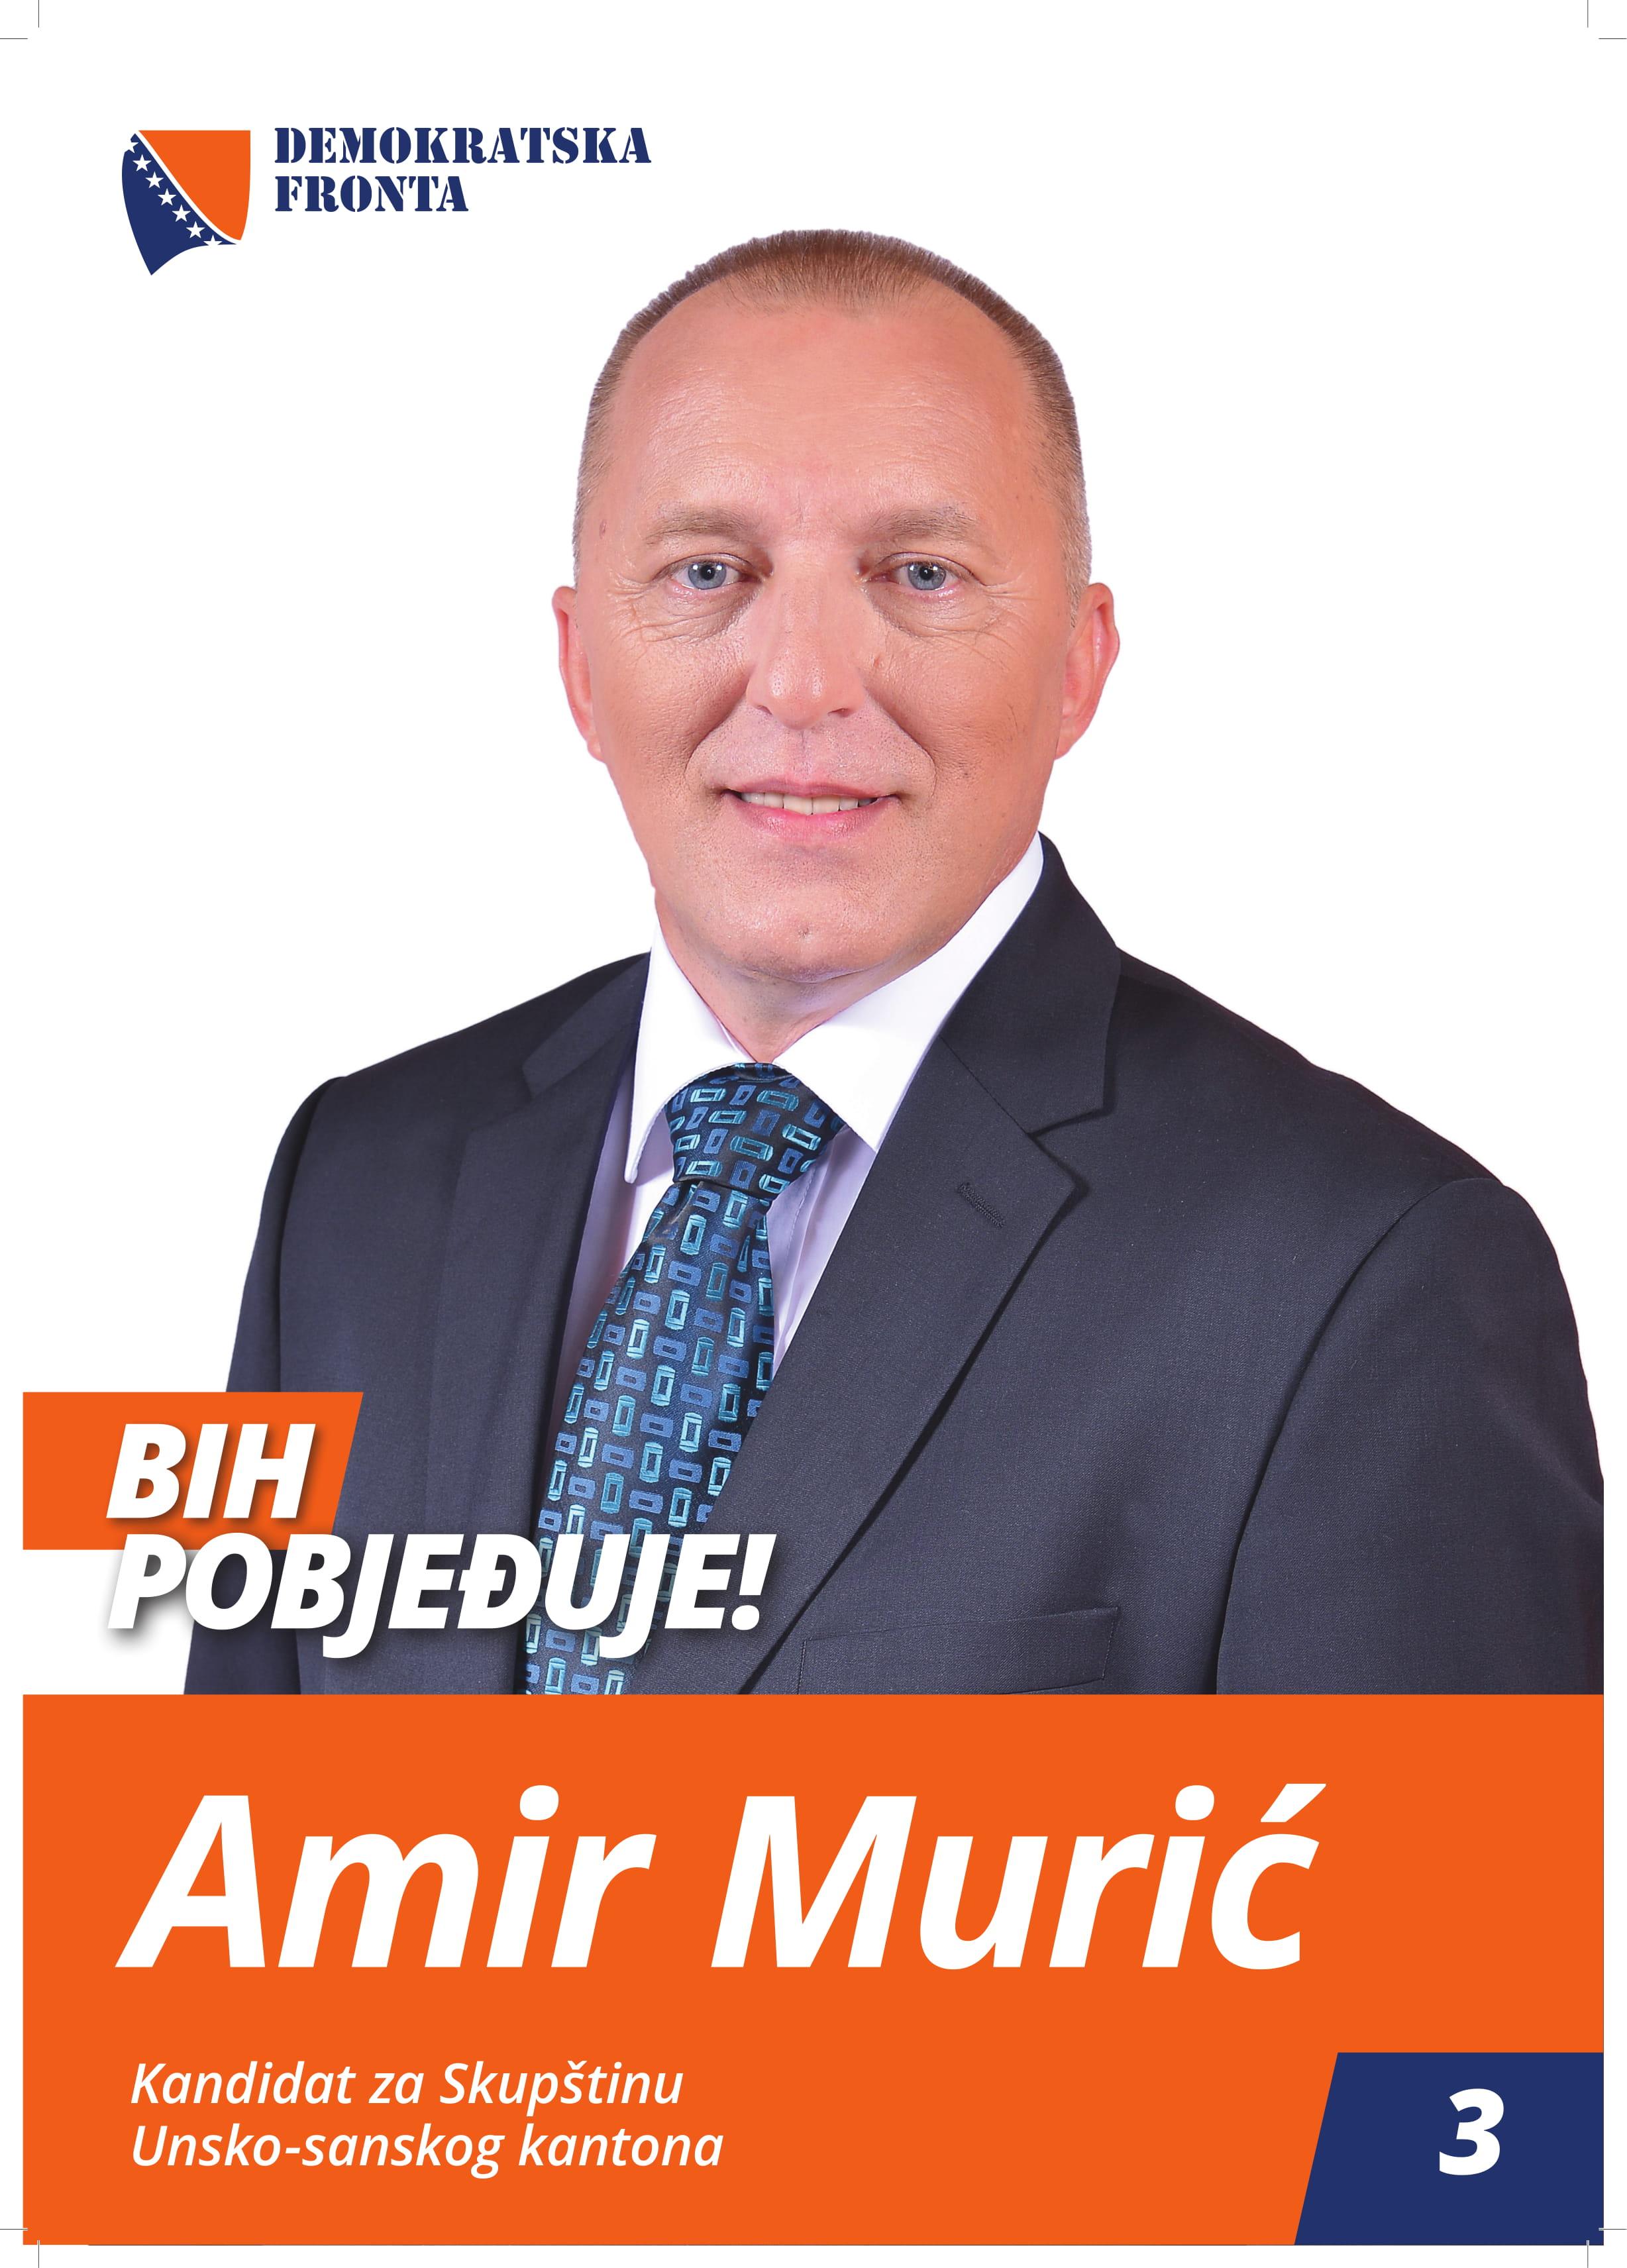 Amir Murić, doktor medicine, specijalista neuropsihijatar